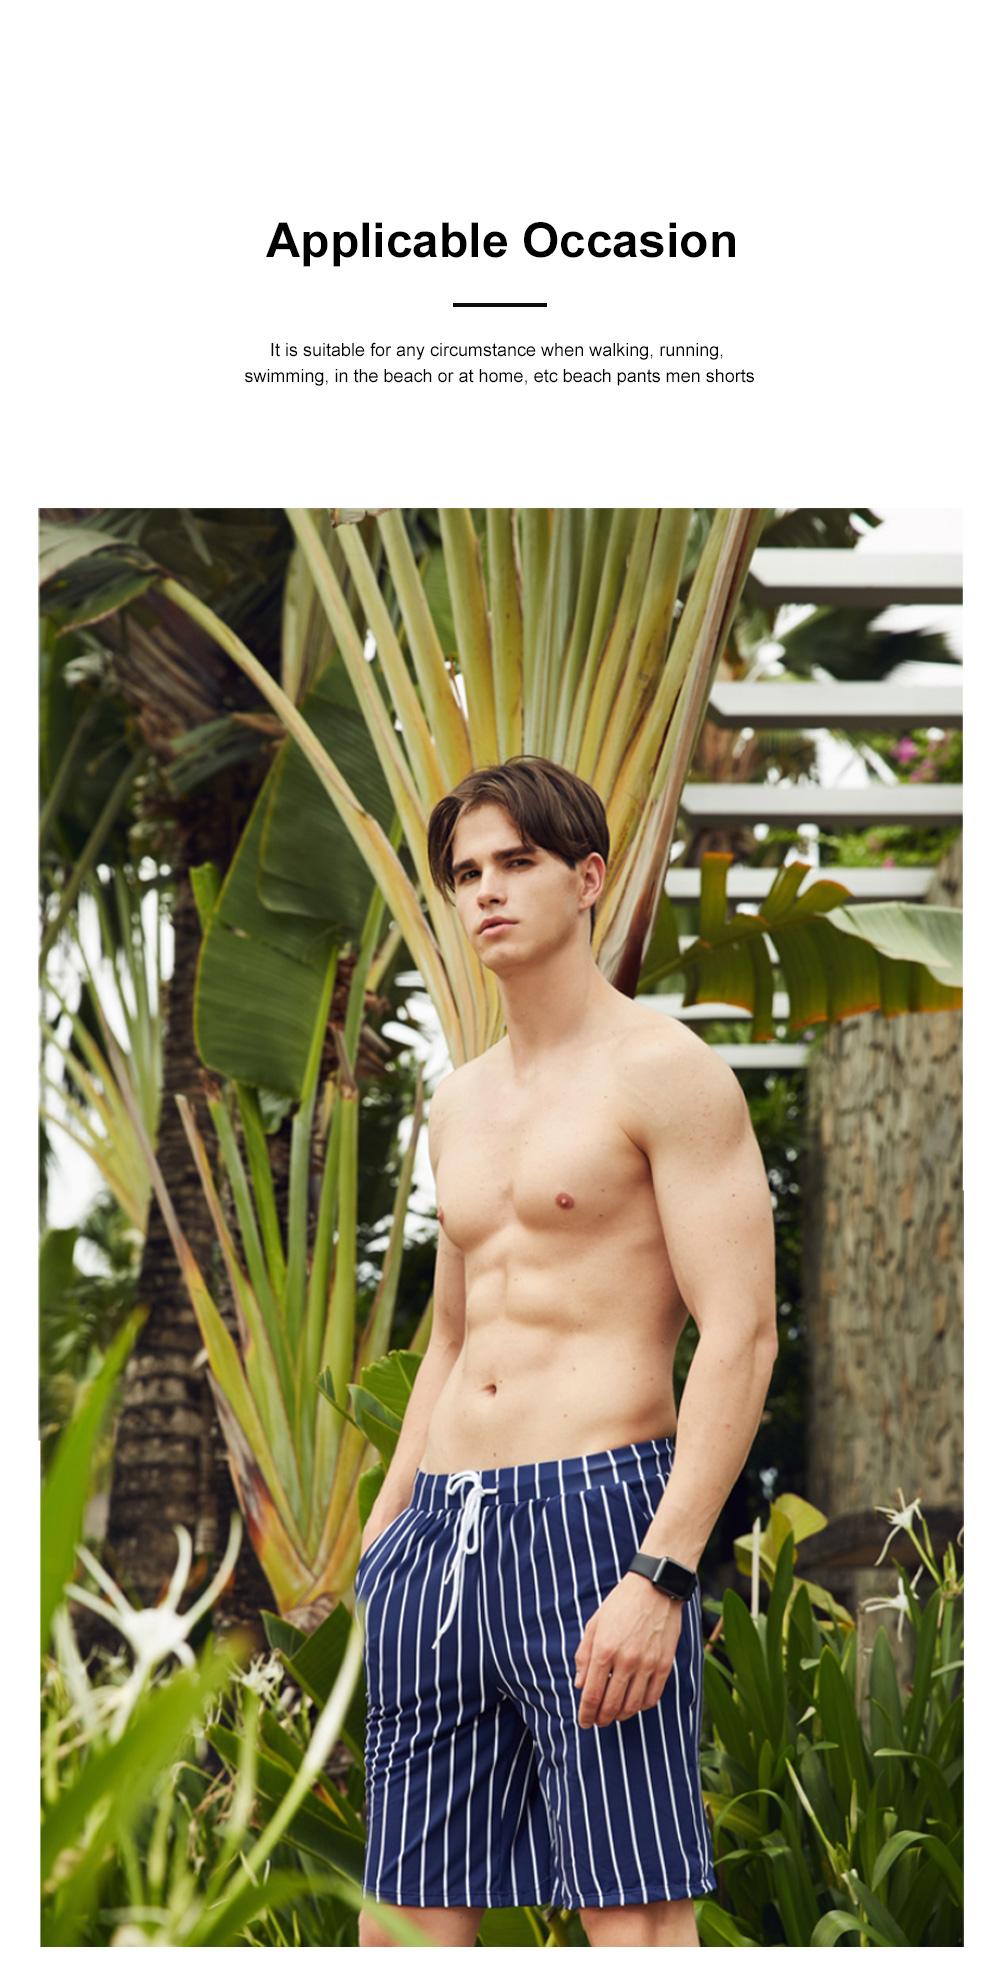 Men Beach Pants Swim Trunk Half Size Colorful Patterns Waterproof Loosing Shorts For Swimming Beach Spring Summer 1